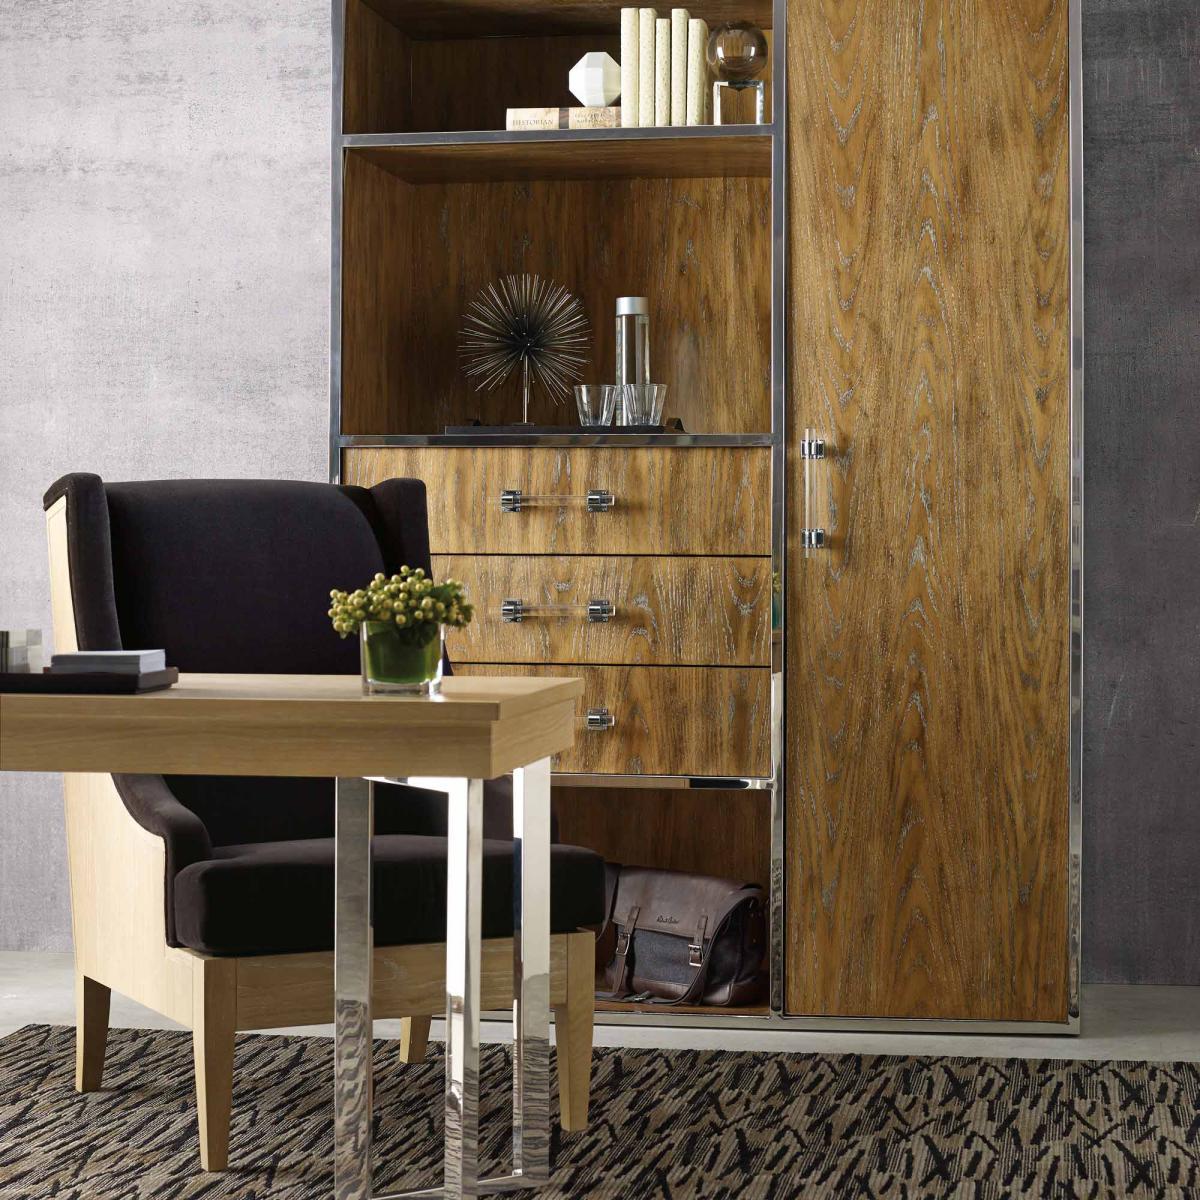 Bernhardt-Hospitality_Stacy-Garcia_719_056_022_018_image_gallery_square.jpg